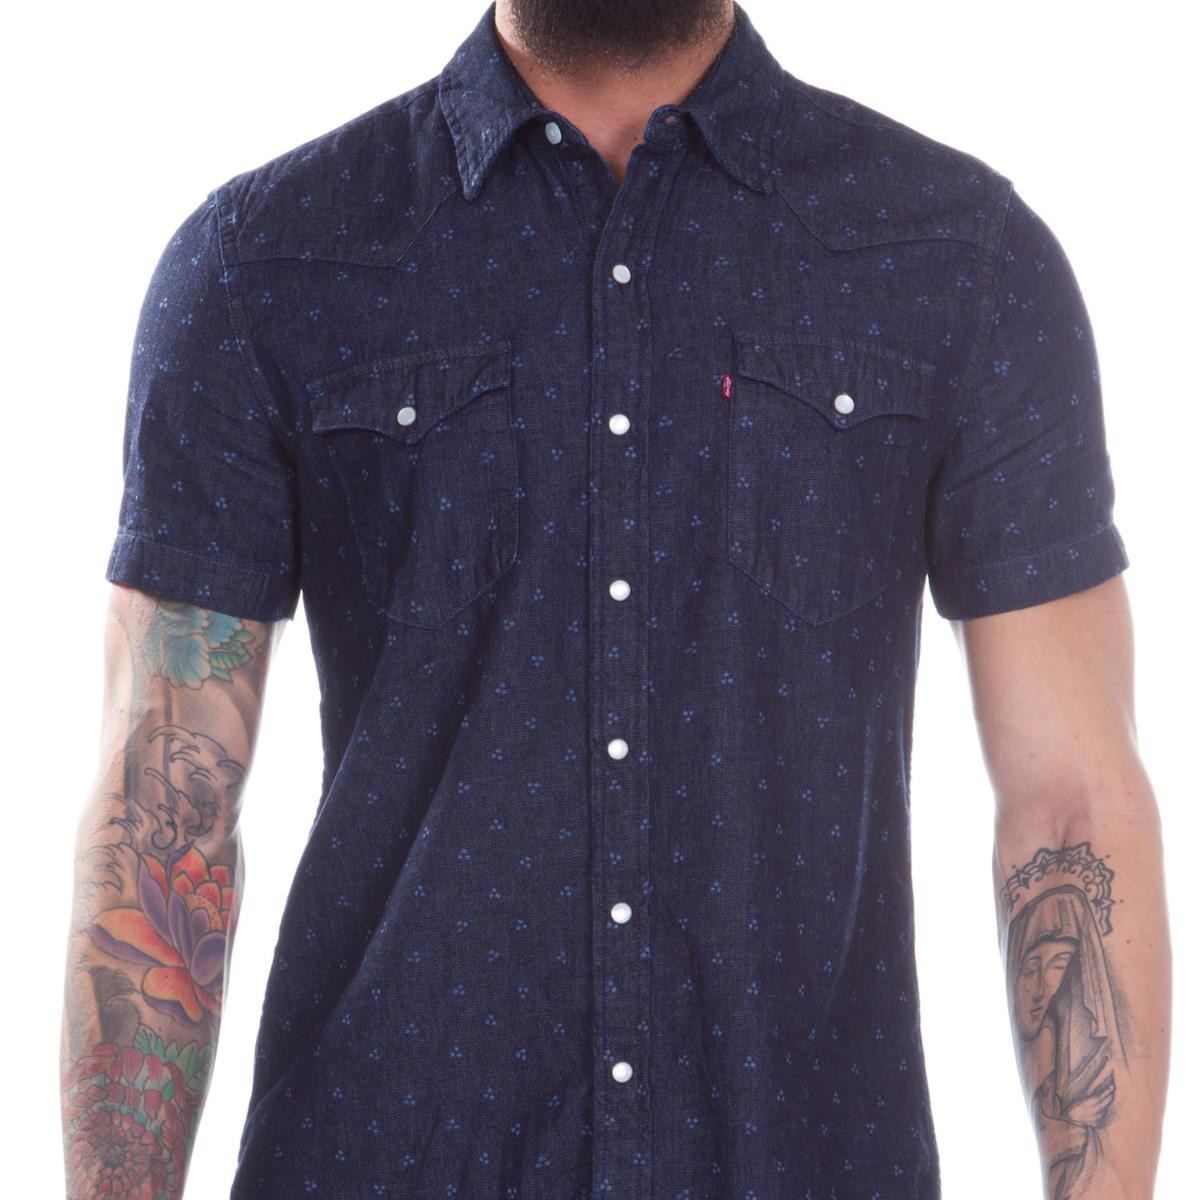 94d5dd1639 camisa jeans levis masc short sleeve classic western escuro. Carregando  zoom.